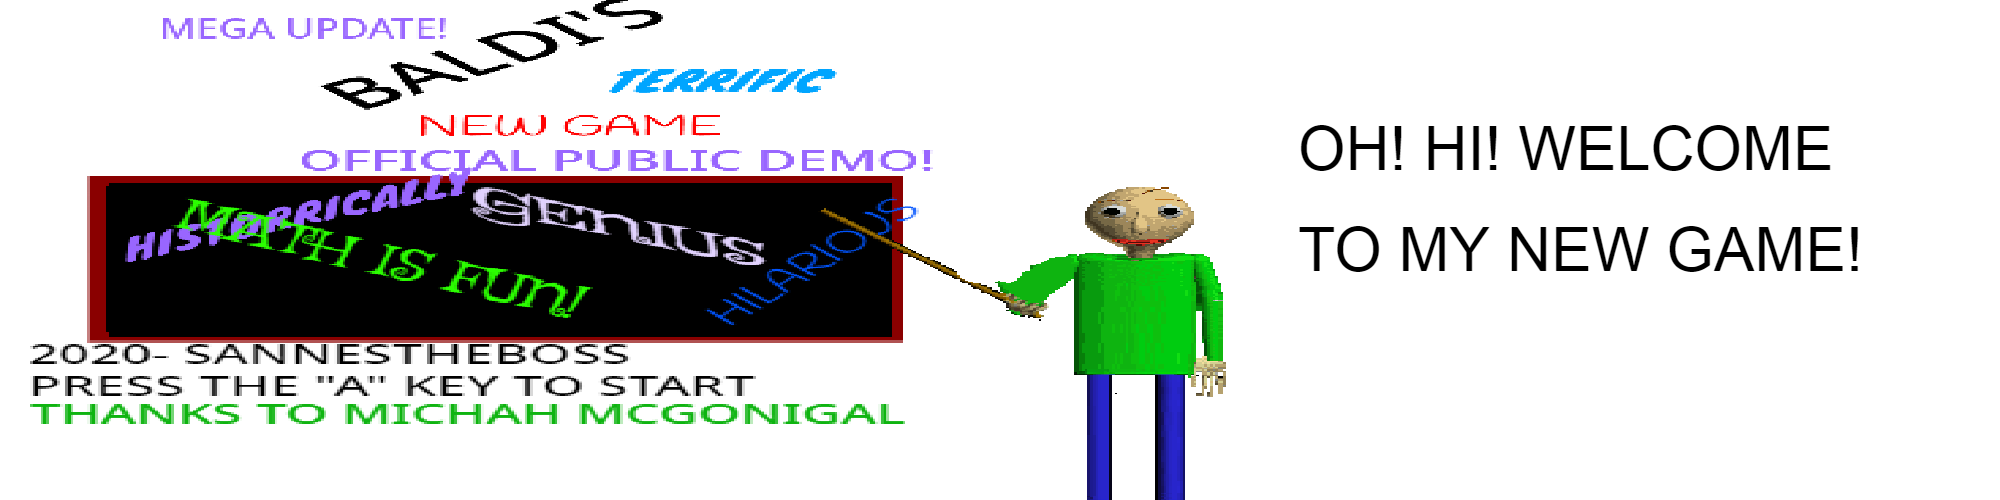 Baldi's Terrific New Game DEMO!